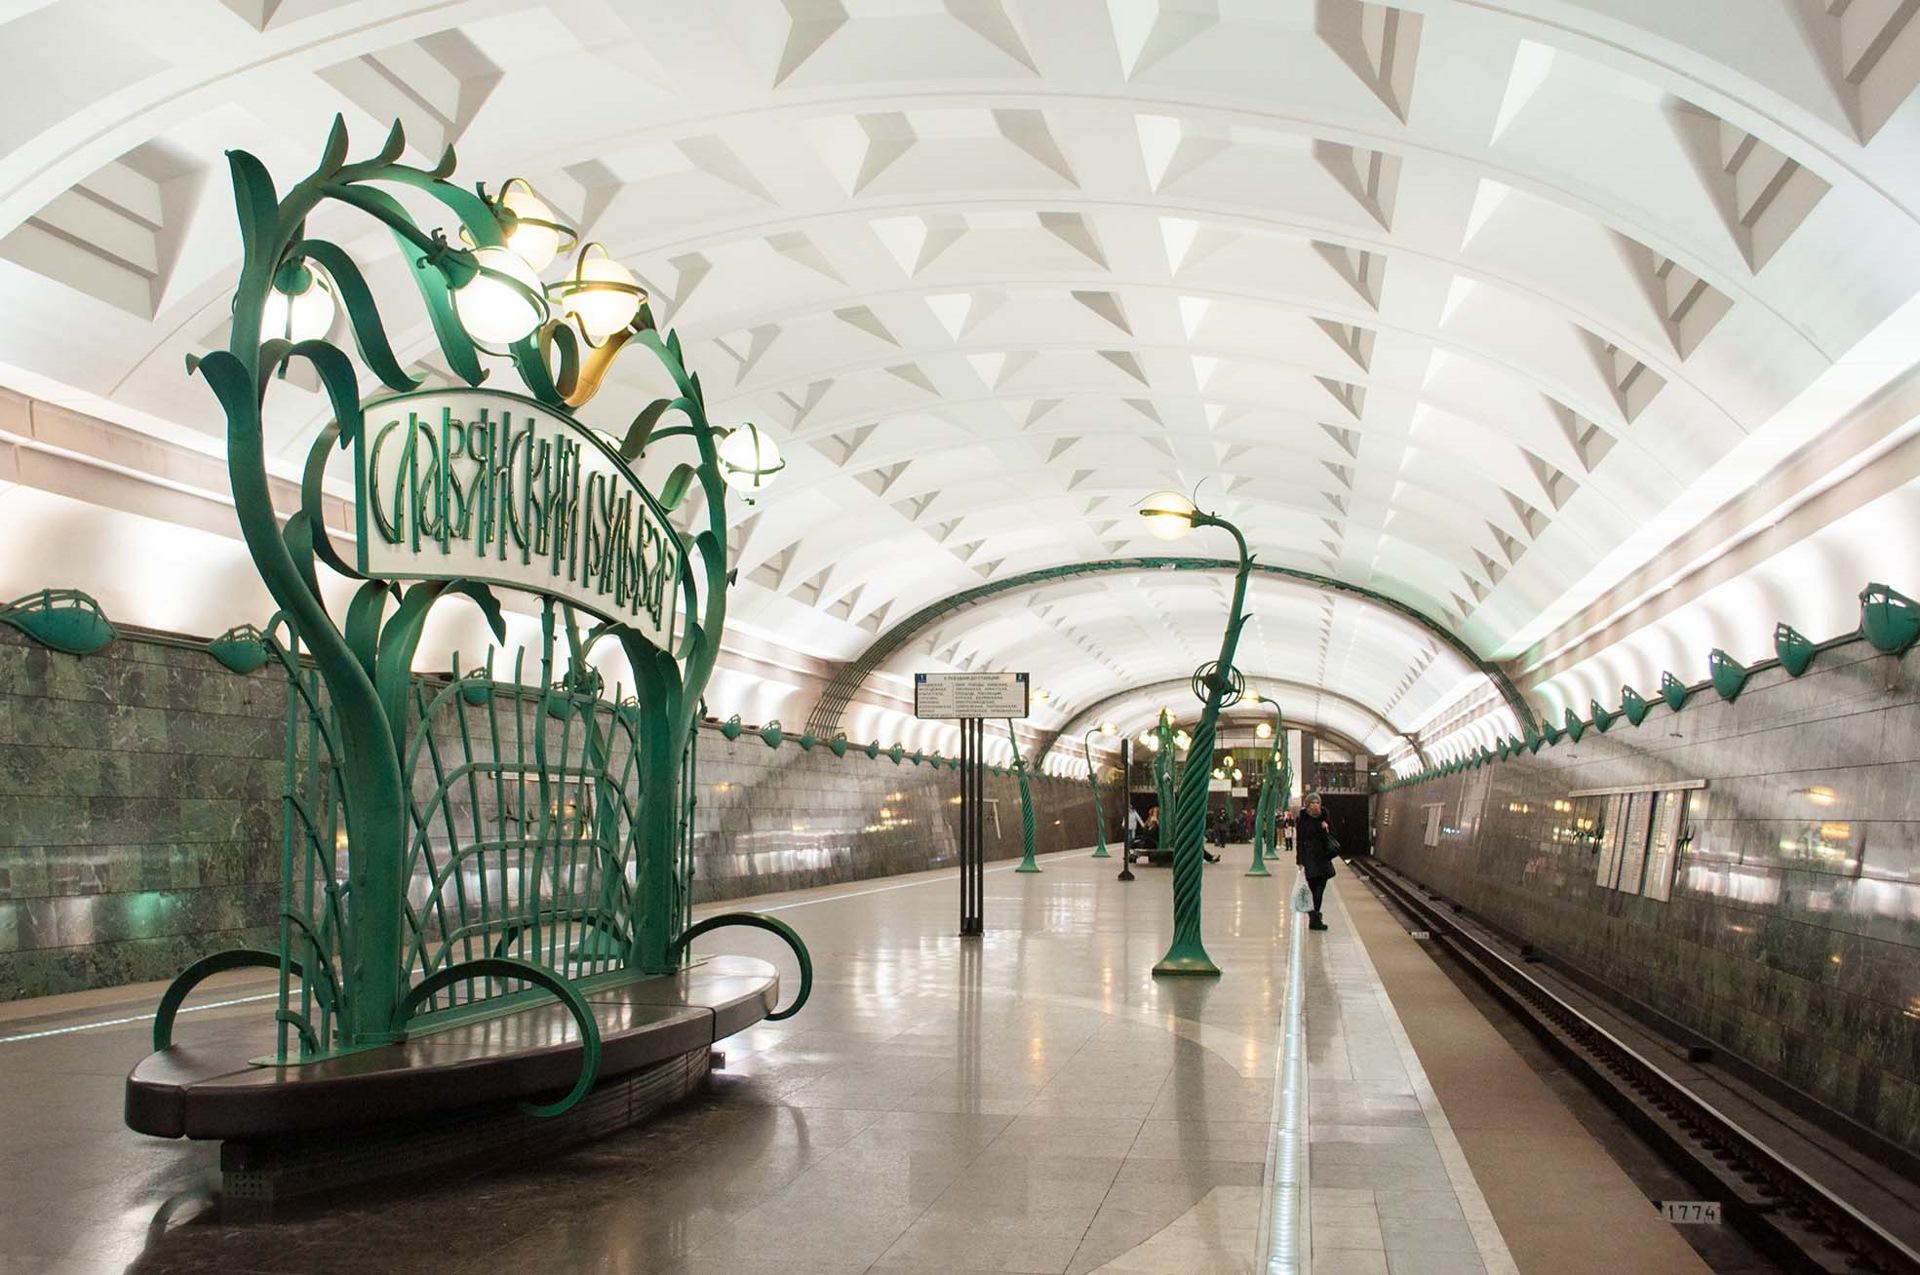 славянский бульвар метро фото семья